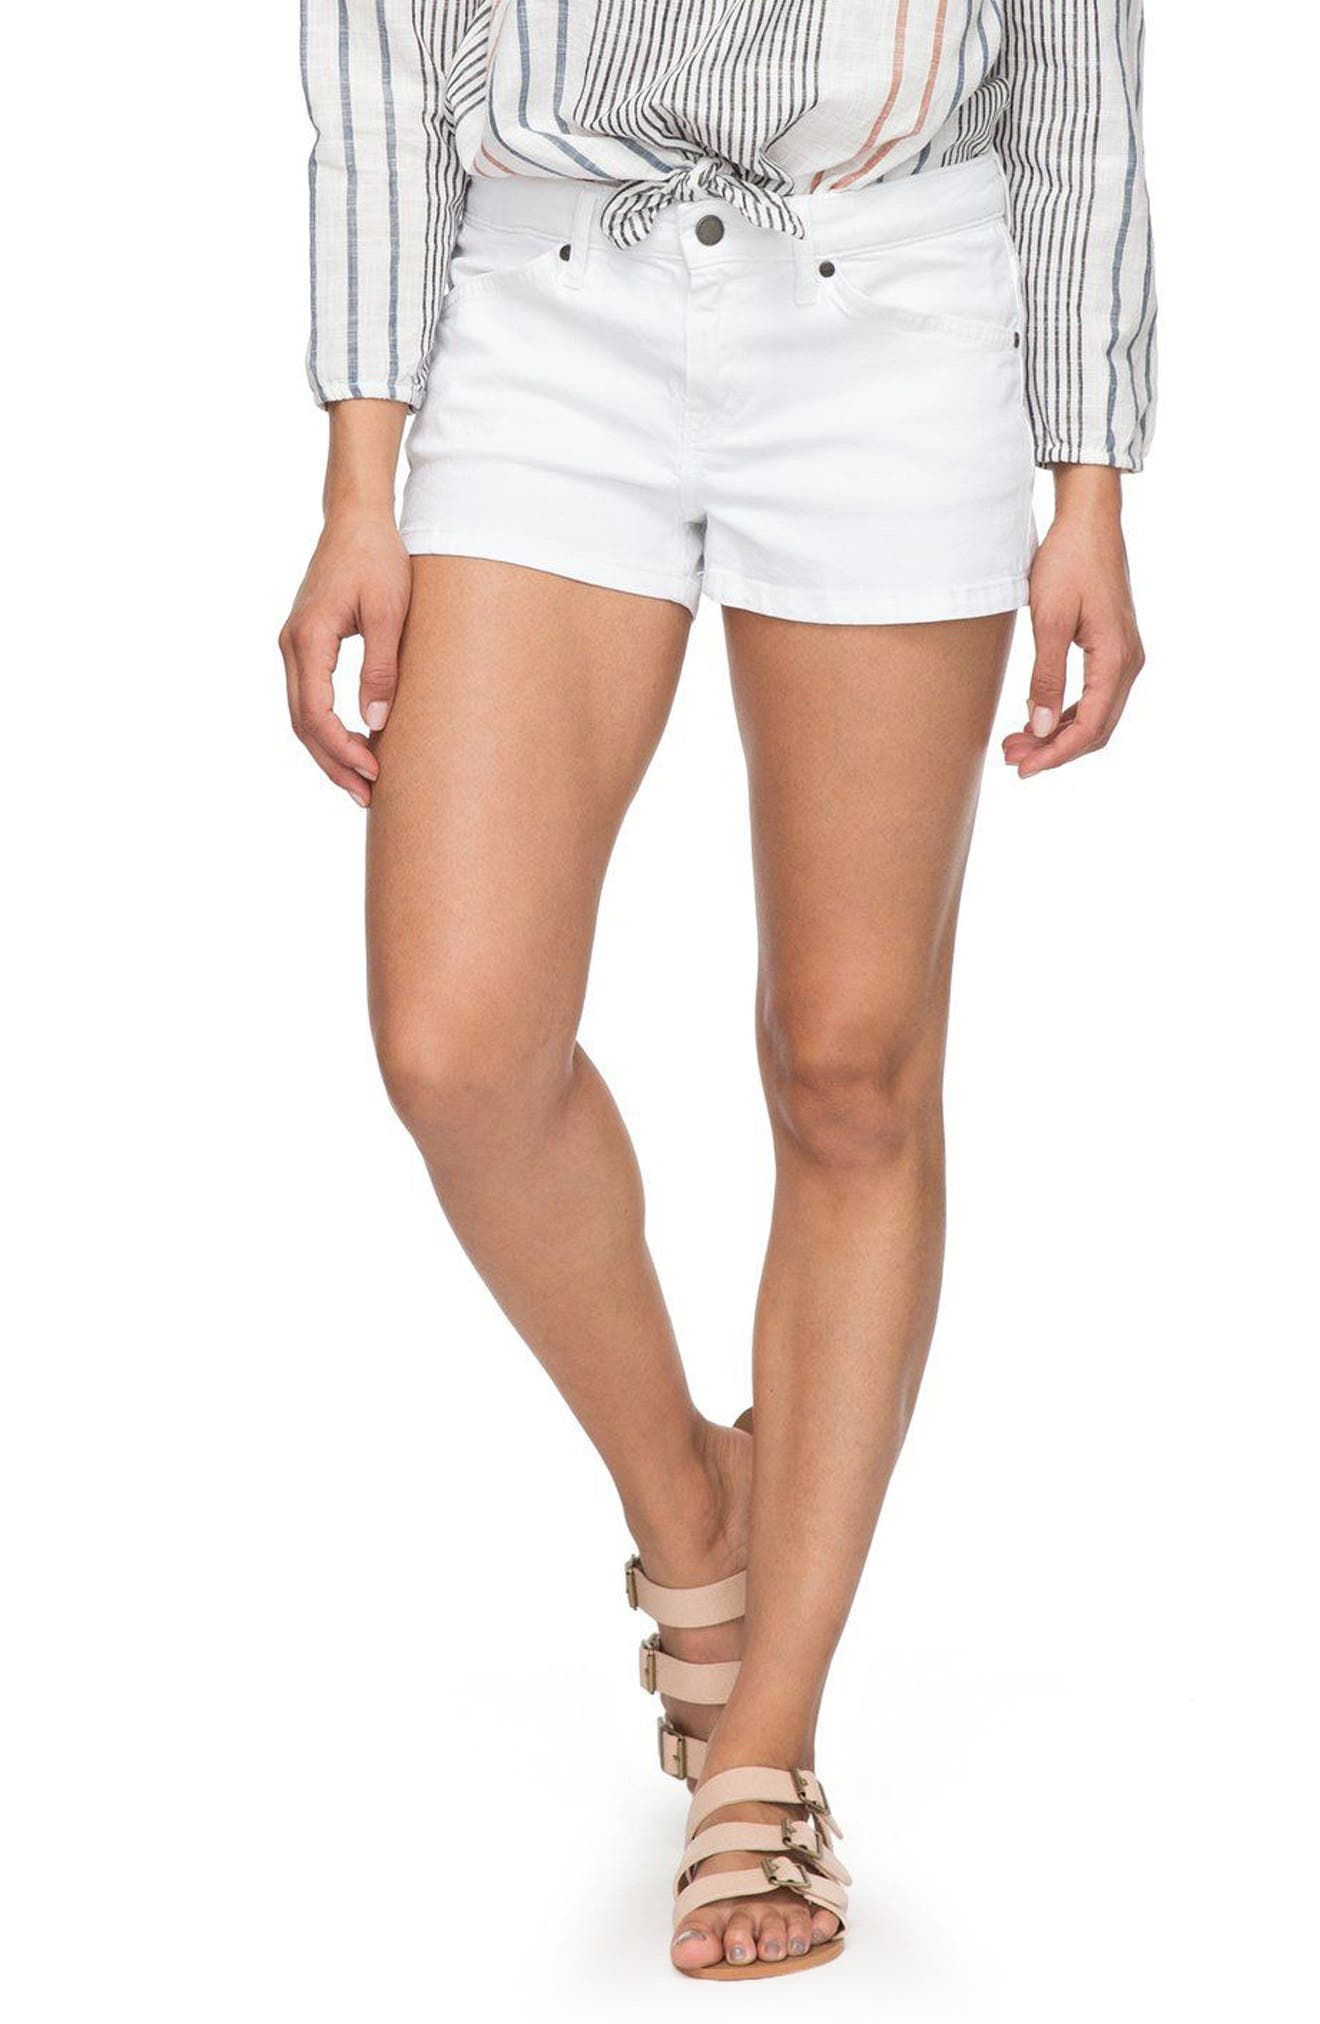 Seatripper Denim Shorts,                         Main,                         color, White